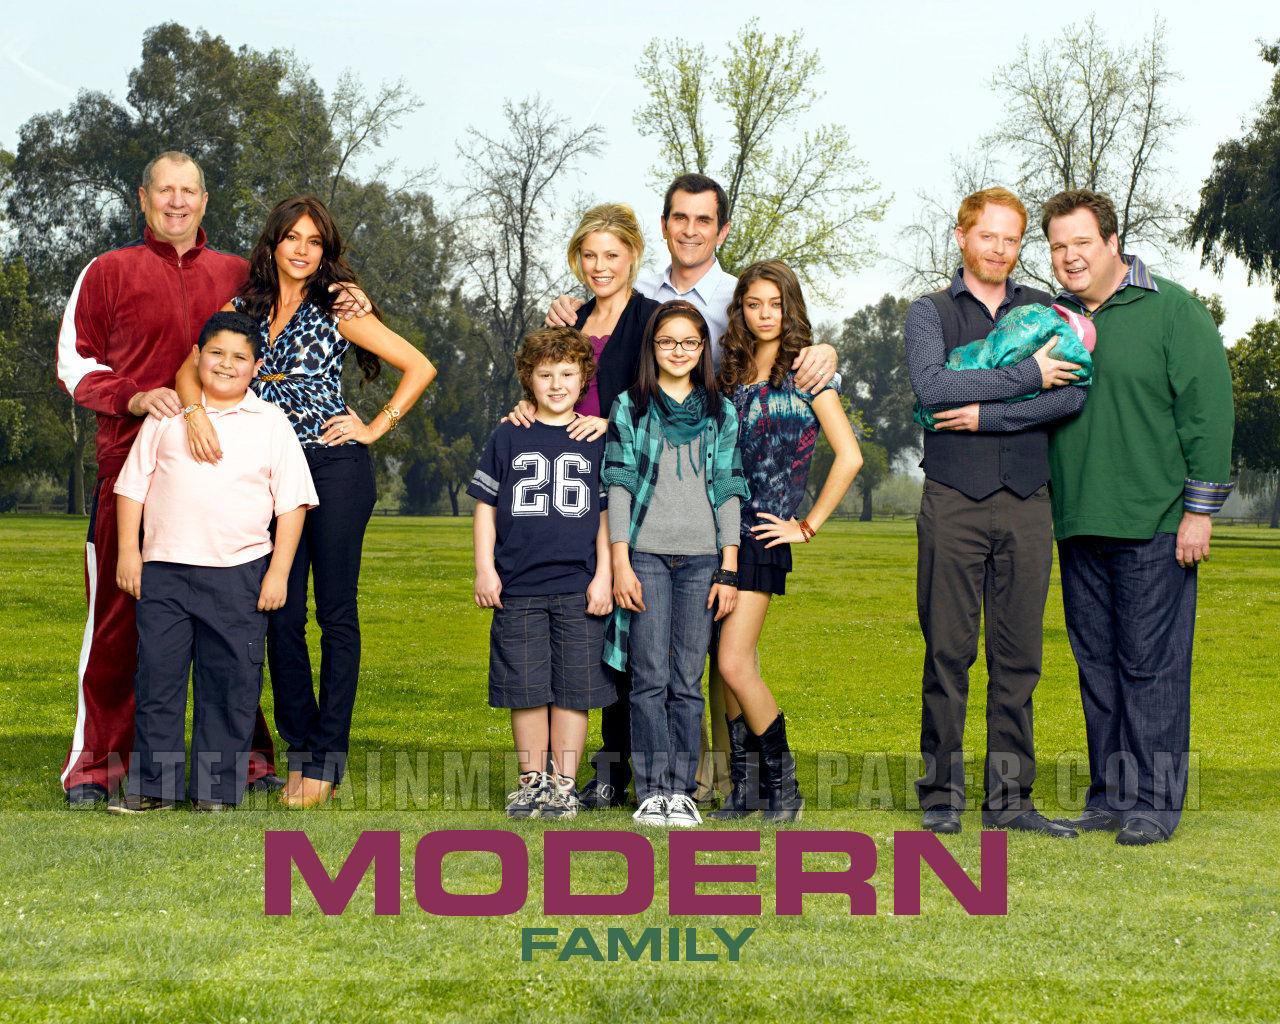 Modern-Family1.jpeg